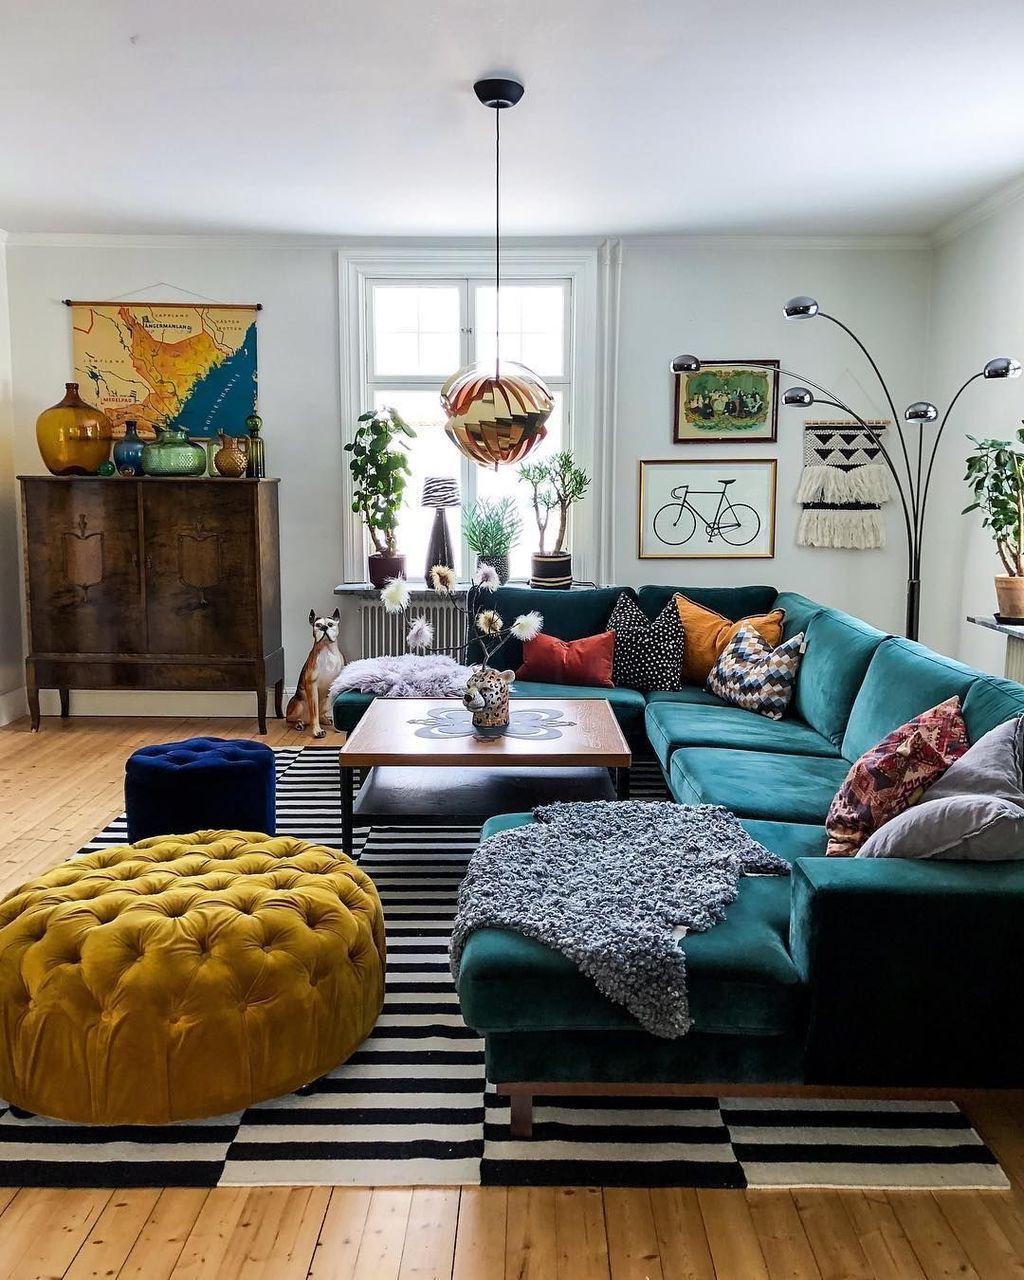 20 Impressive Salon Room Design Ideas Trenduhome Colorful Eclectic Living Room Eclectic Living Room Interior Design Living Room Warm Living room ideas eclectic